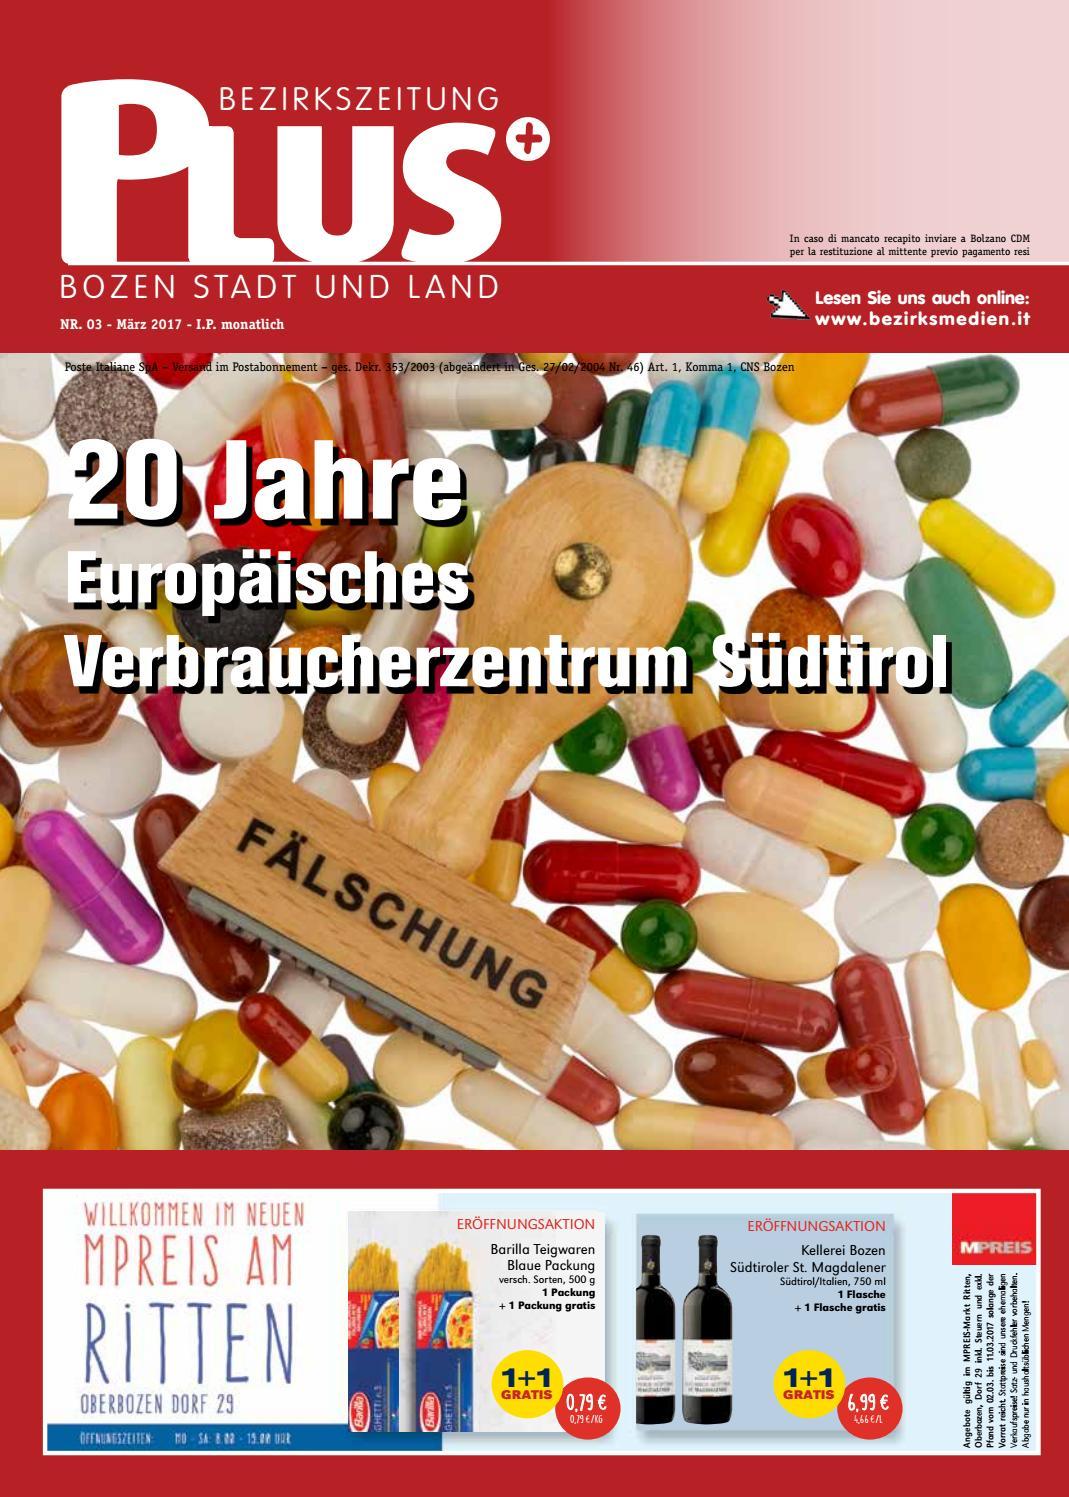 PLUS Nr. 03 vom 02/03/2017 by Bezirksmedien GmbH - issuu